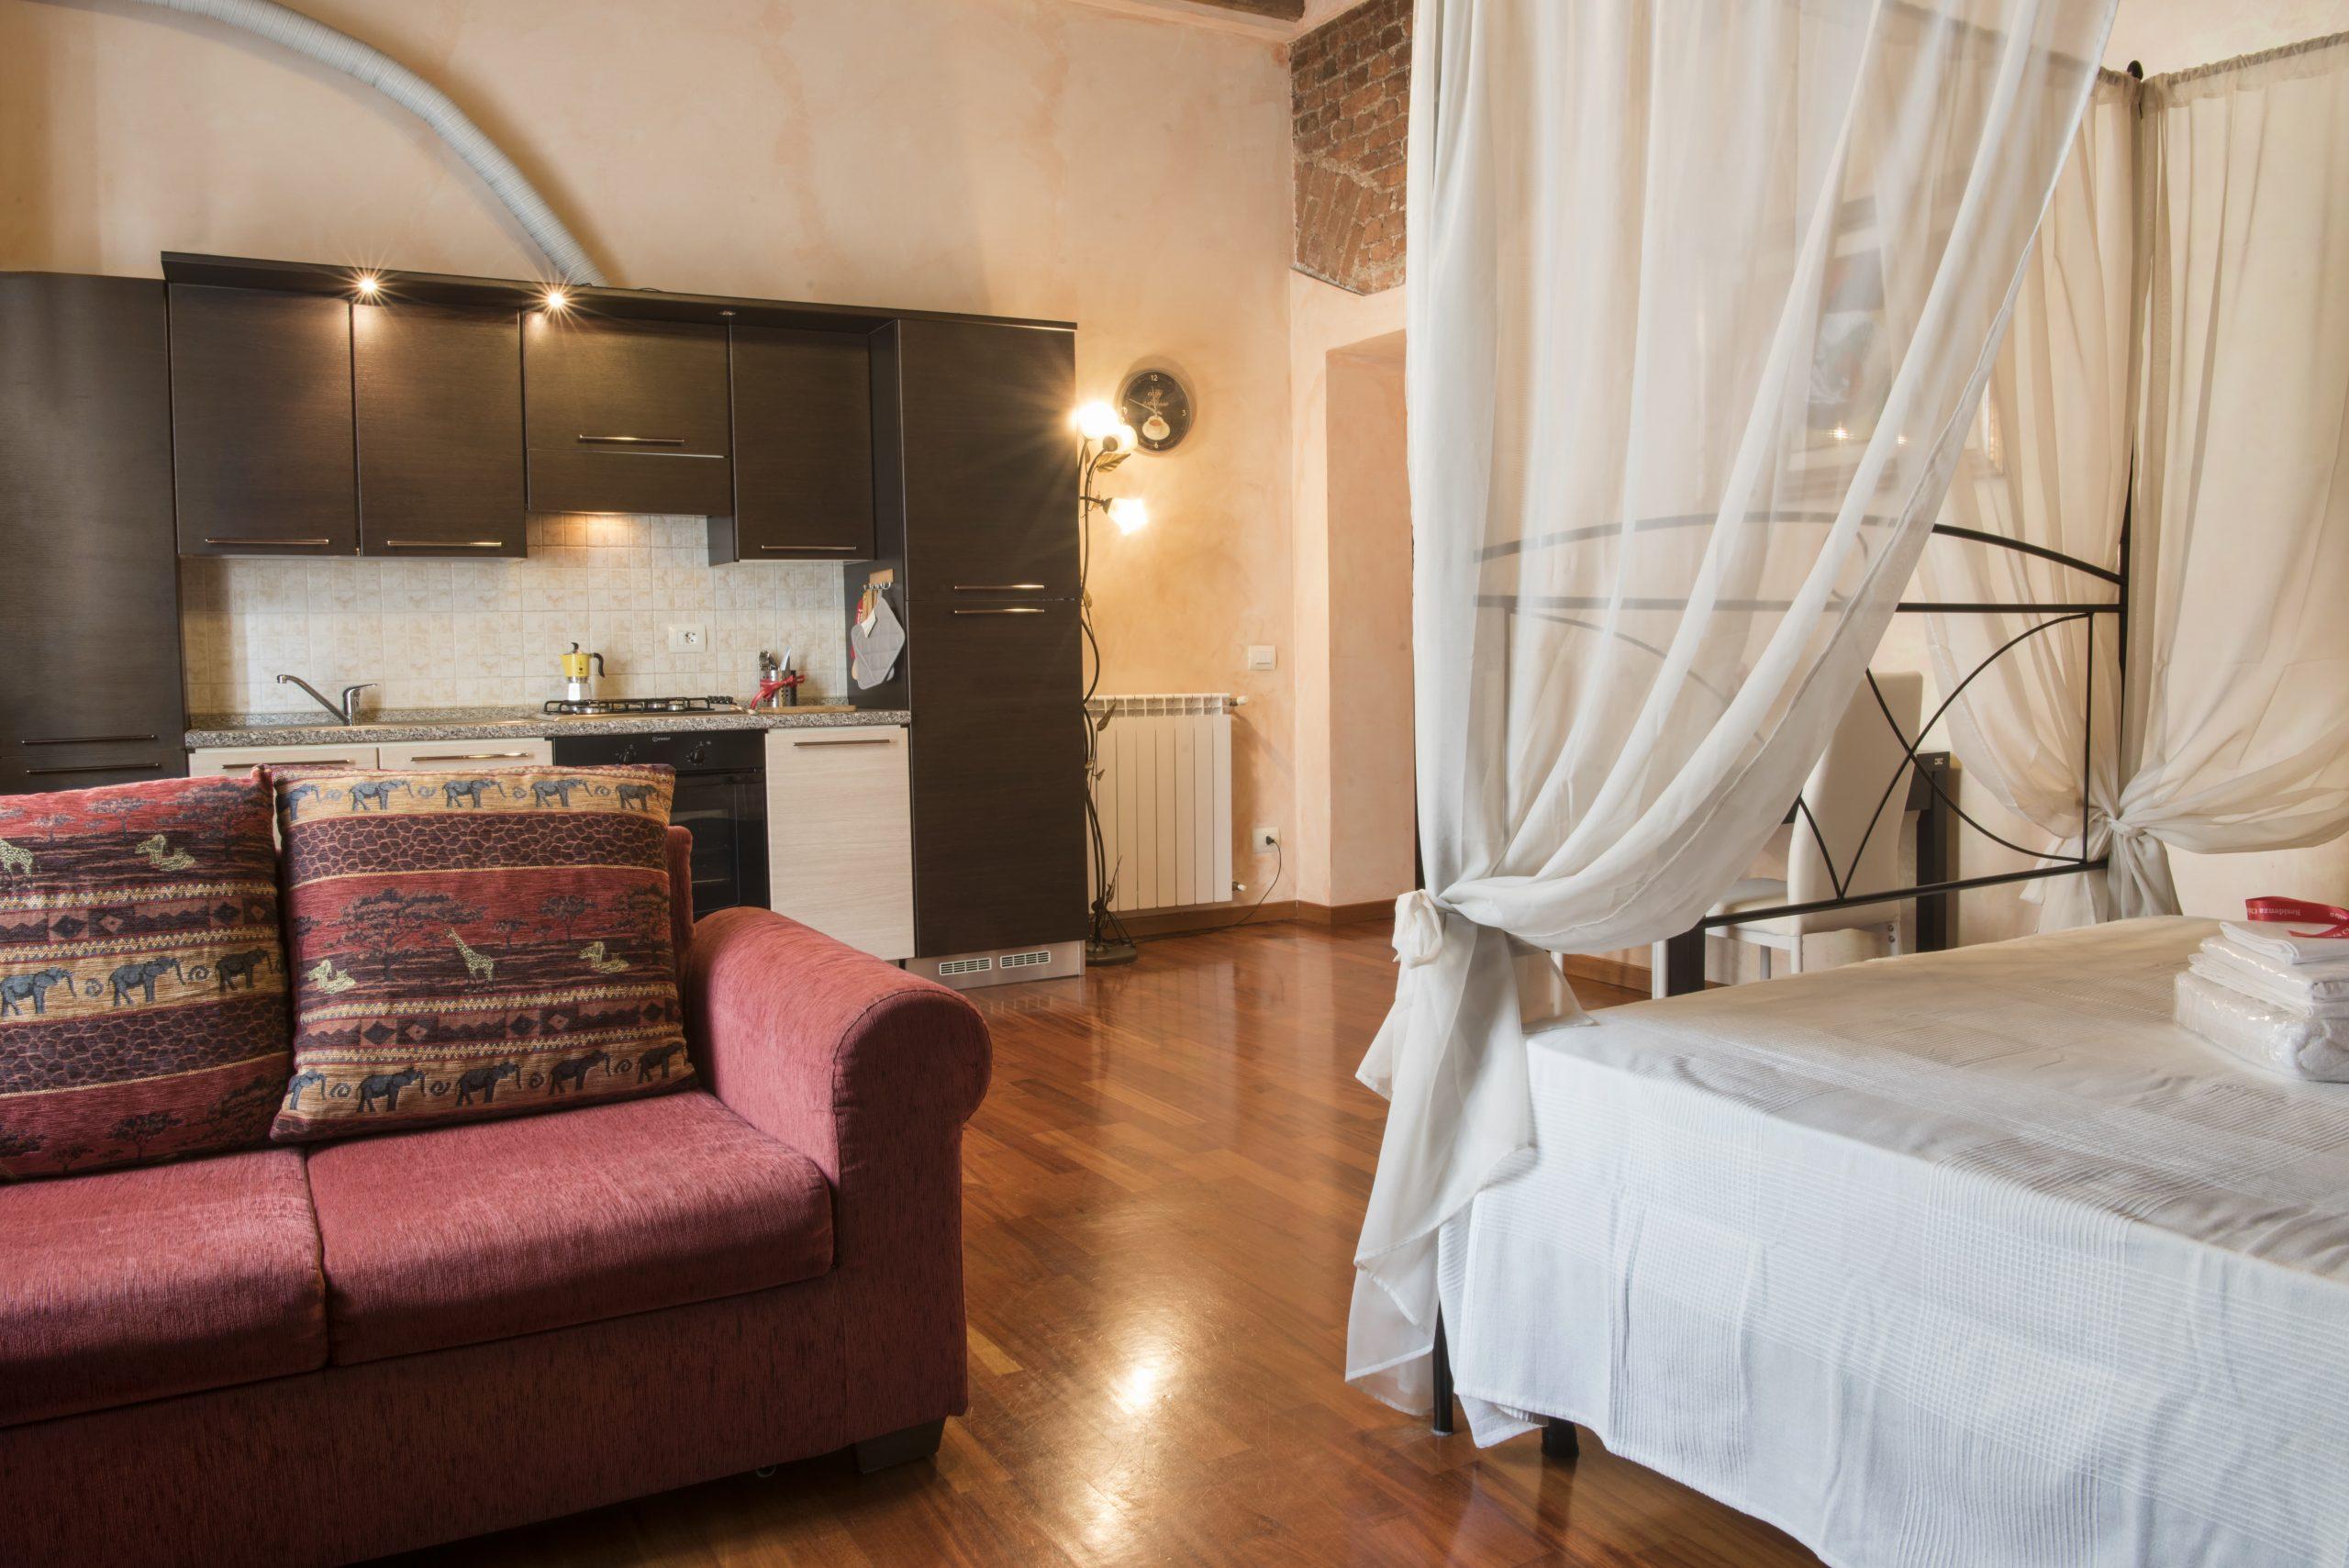 appartamento-orsa-minore-residence-chiaralba-salotto.jpg